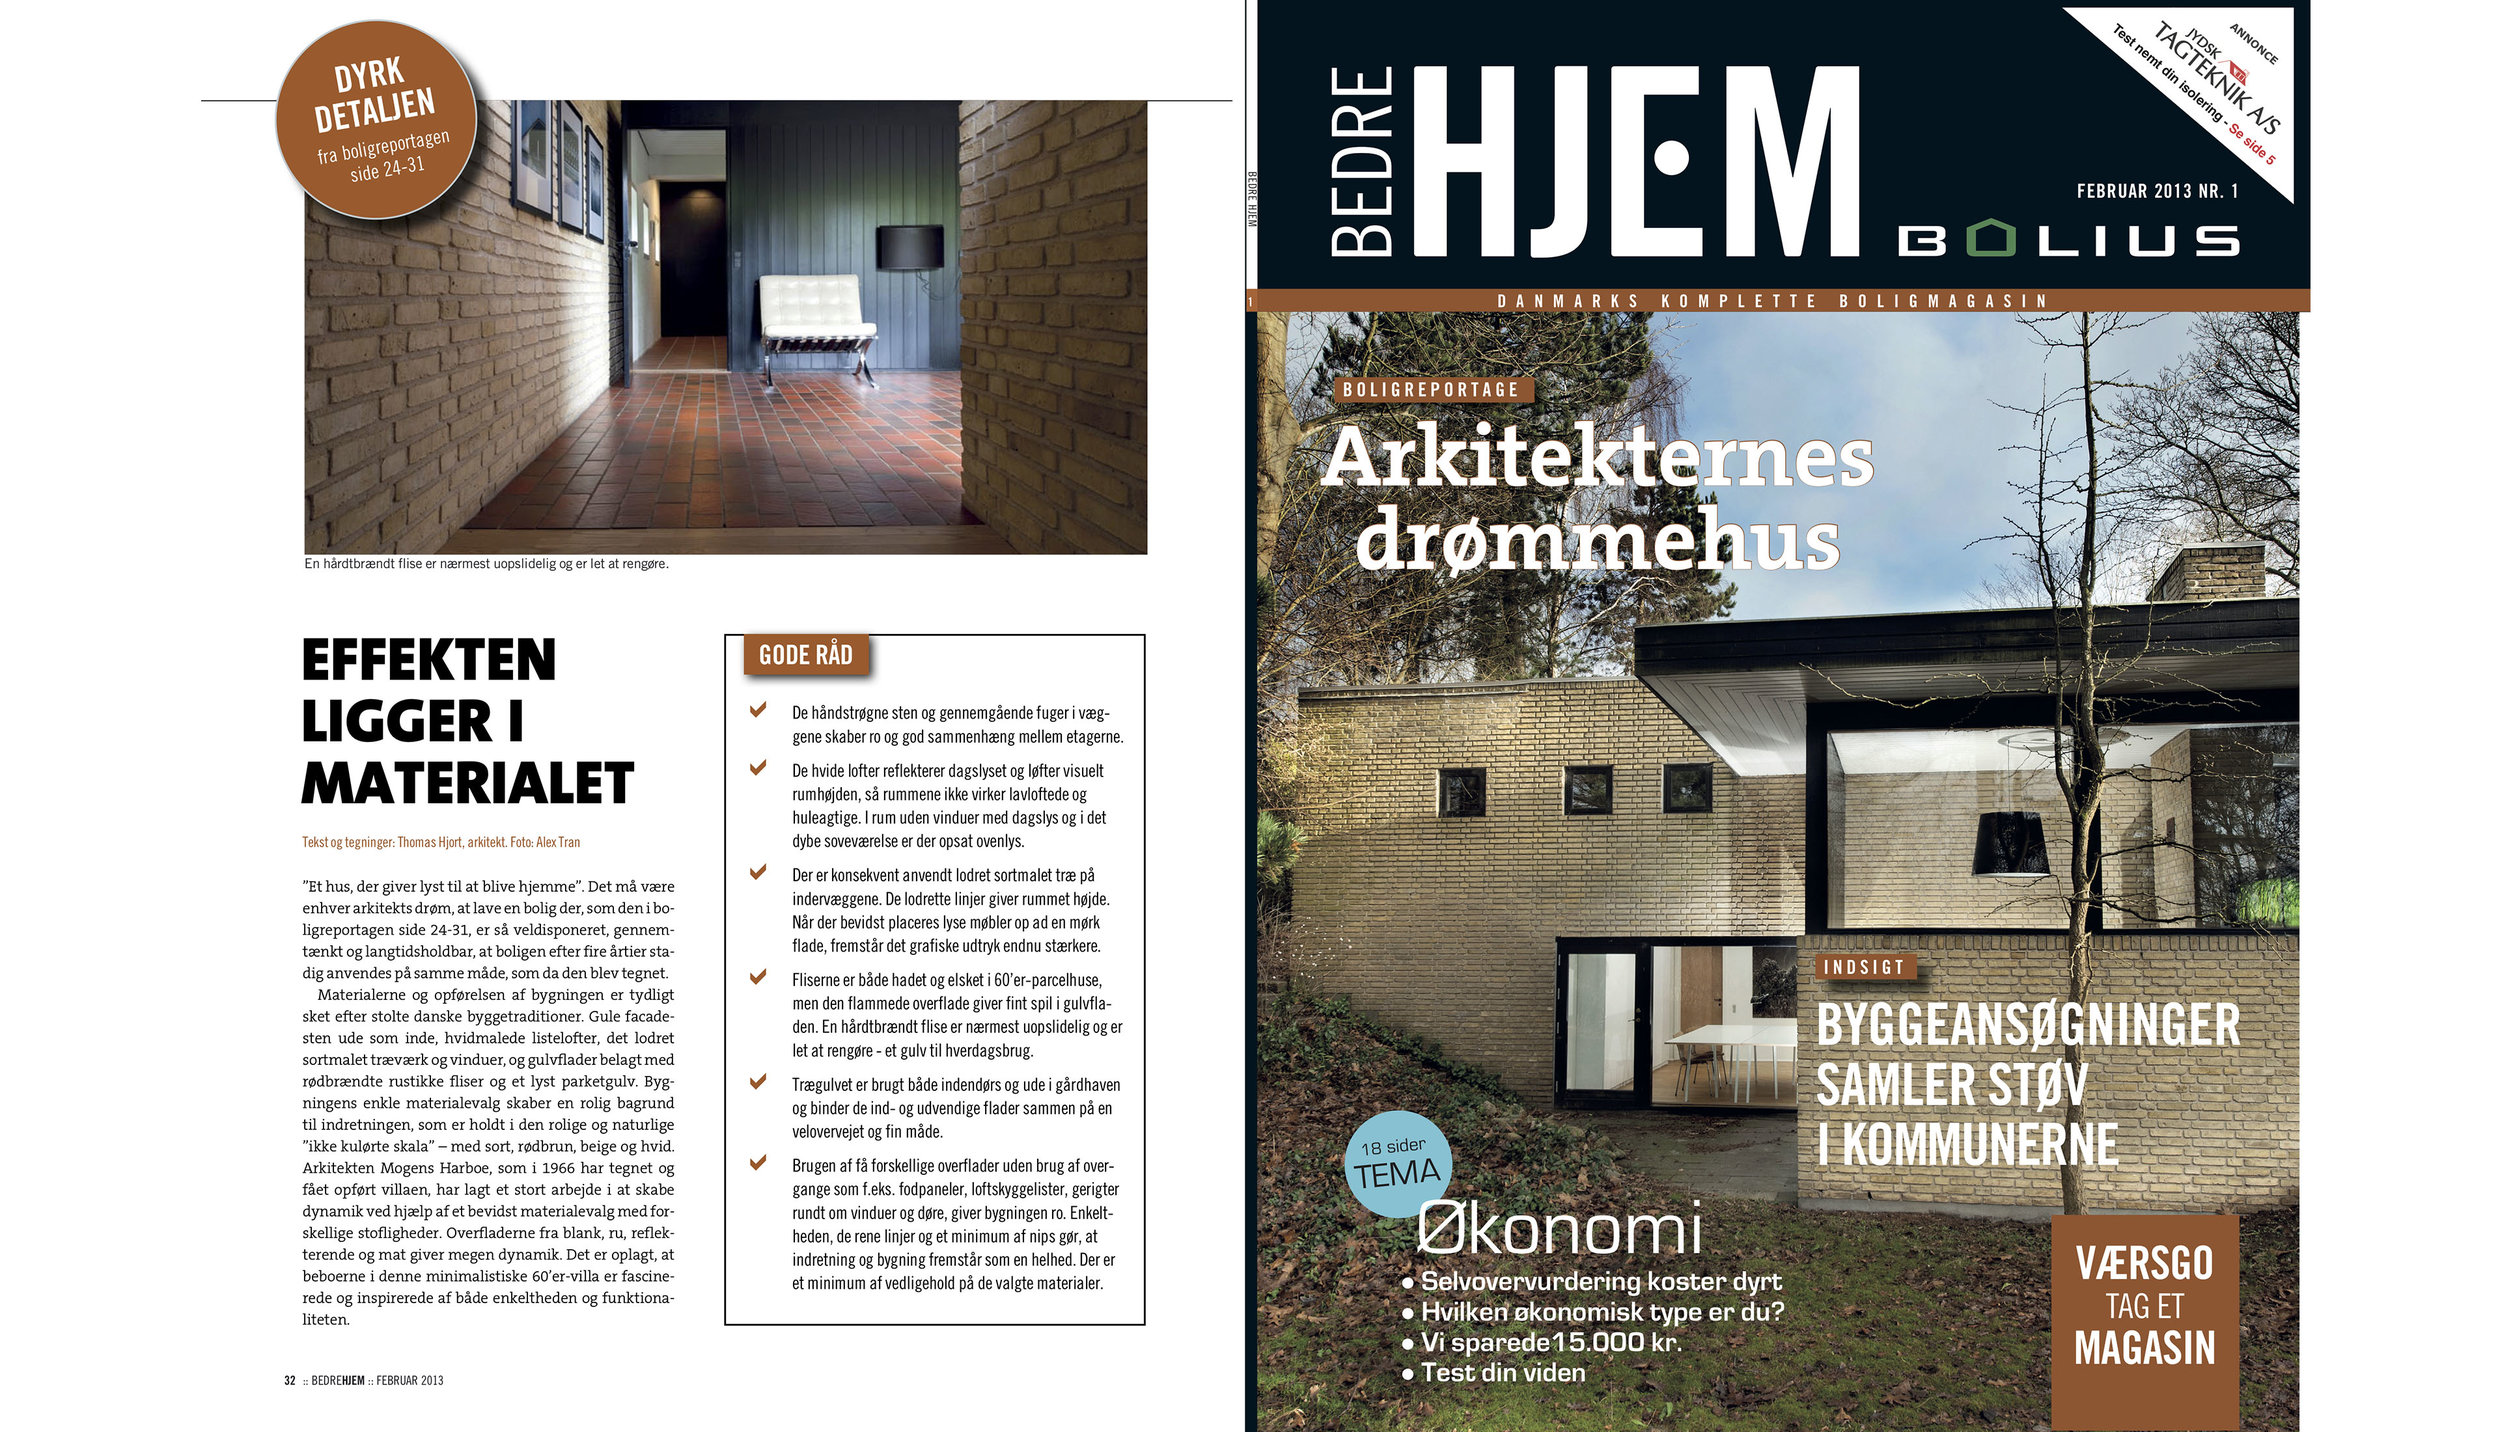 sofie-ladefoged-press-bolius-2013-page-06.jpg